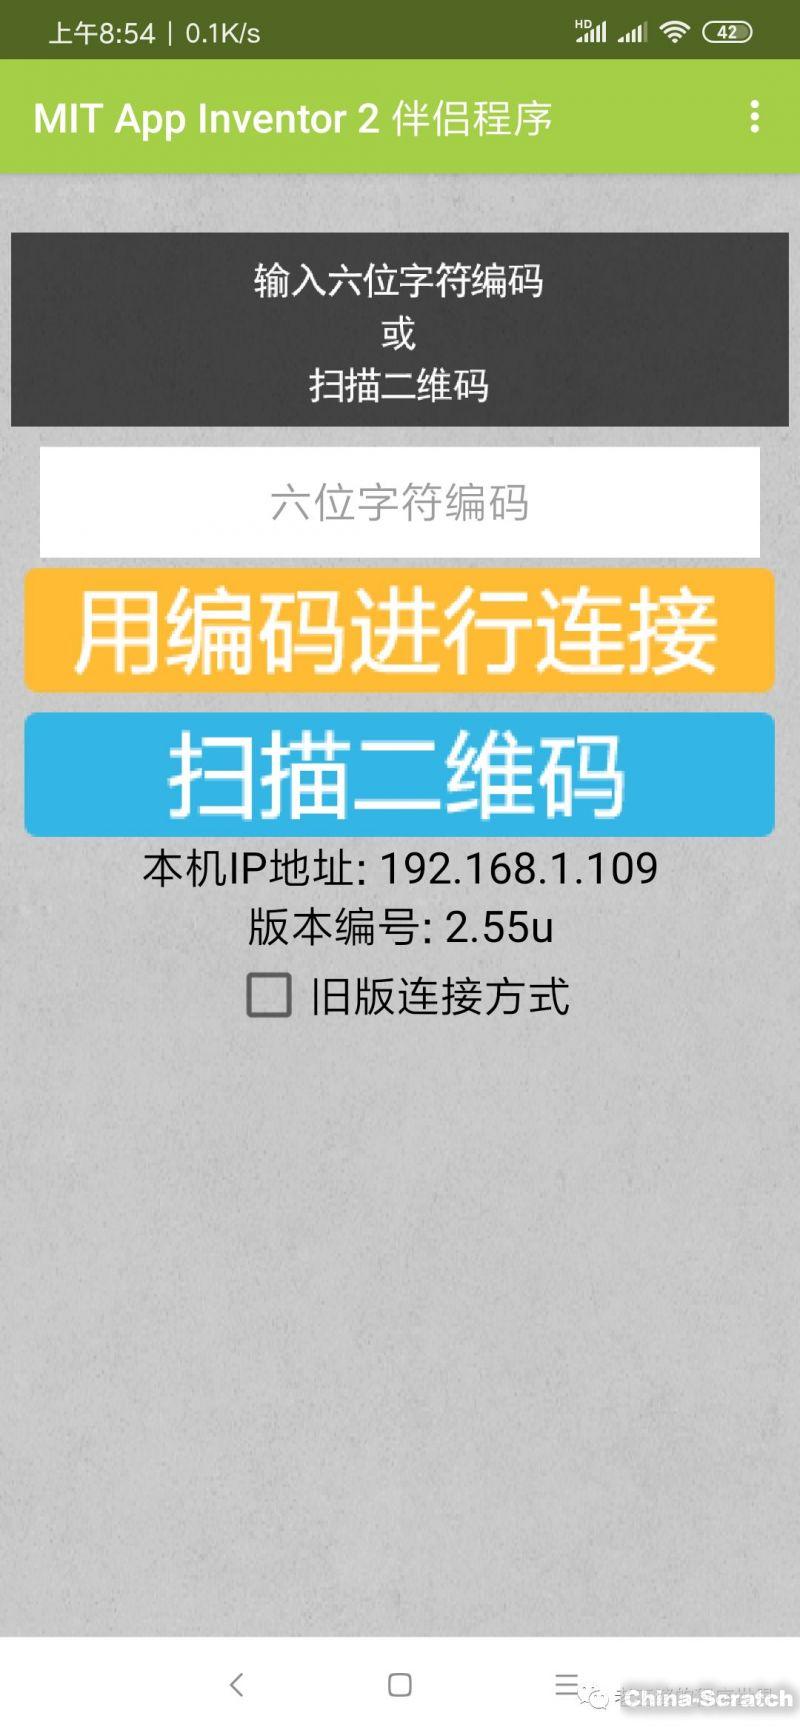 https://cdn.china-scratch.com/timg/191030/15491360a-4.jpg